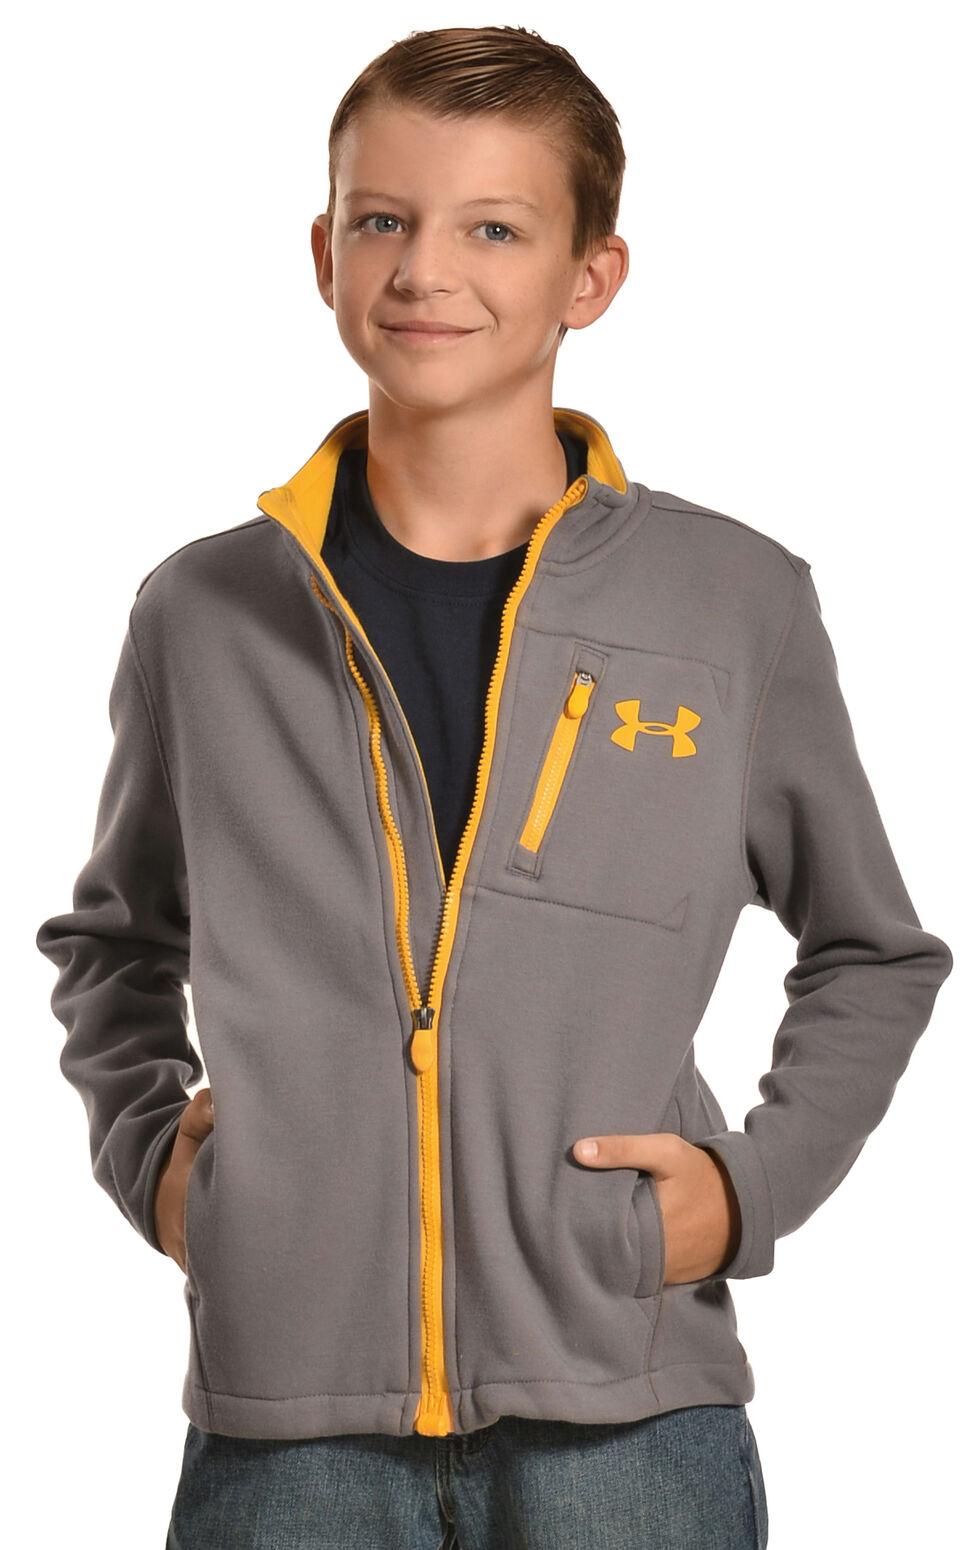 Under Armour Kids' Grantie Jacket, Grey, hi-res